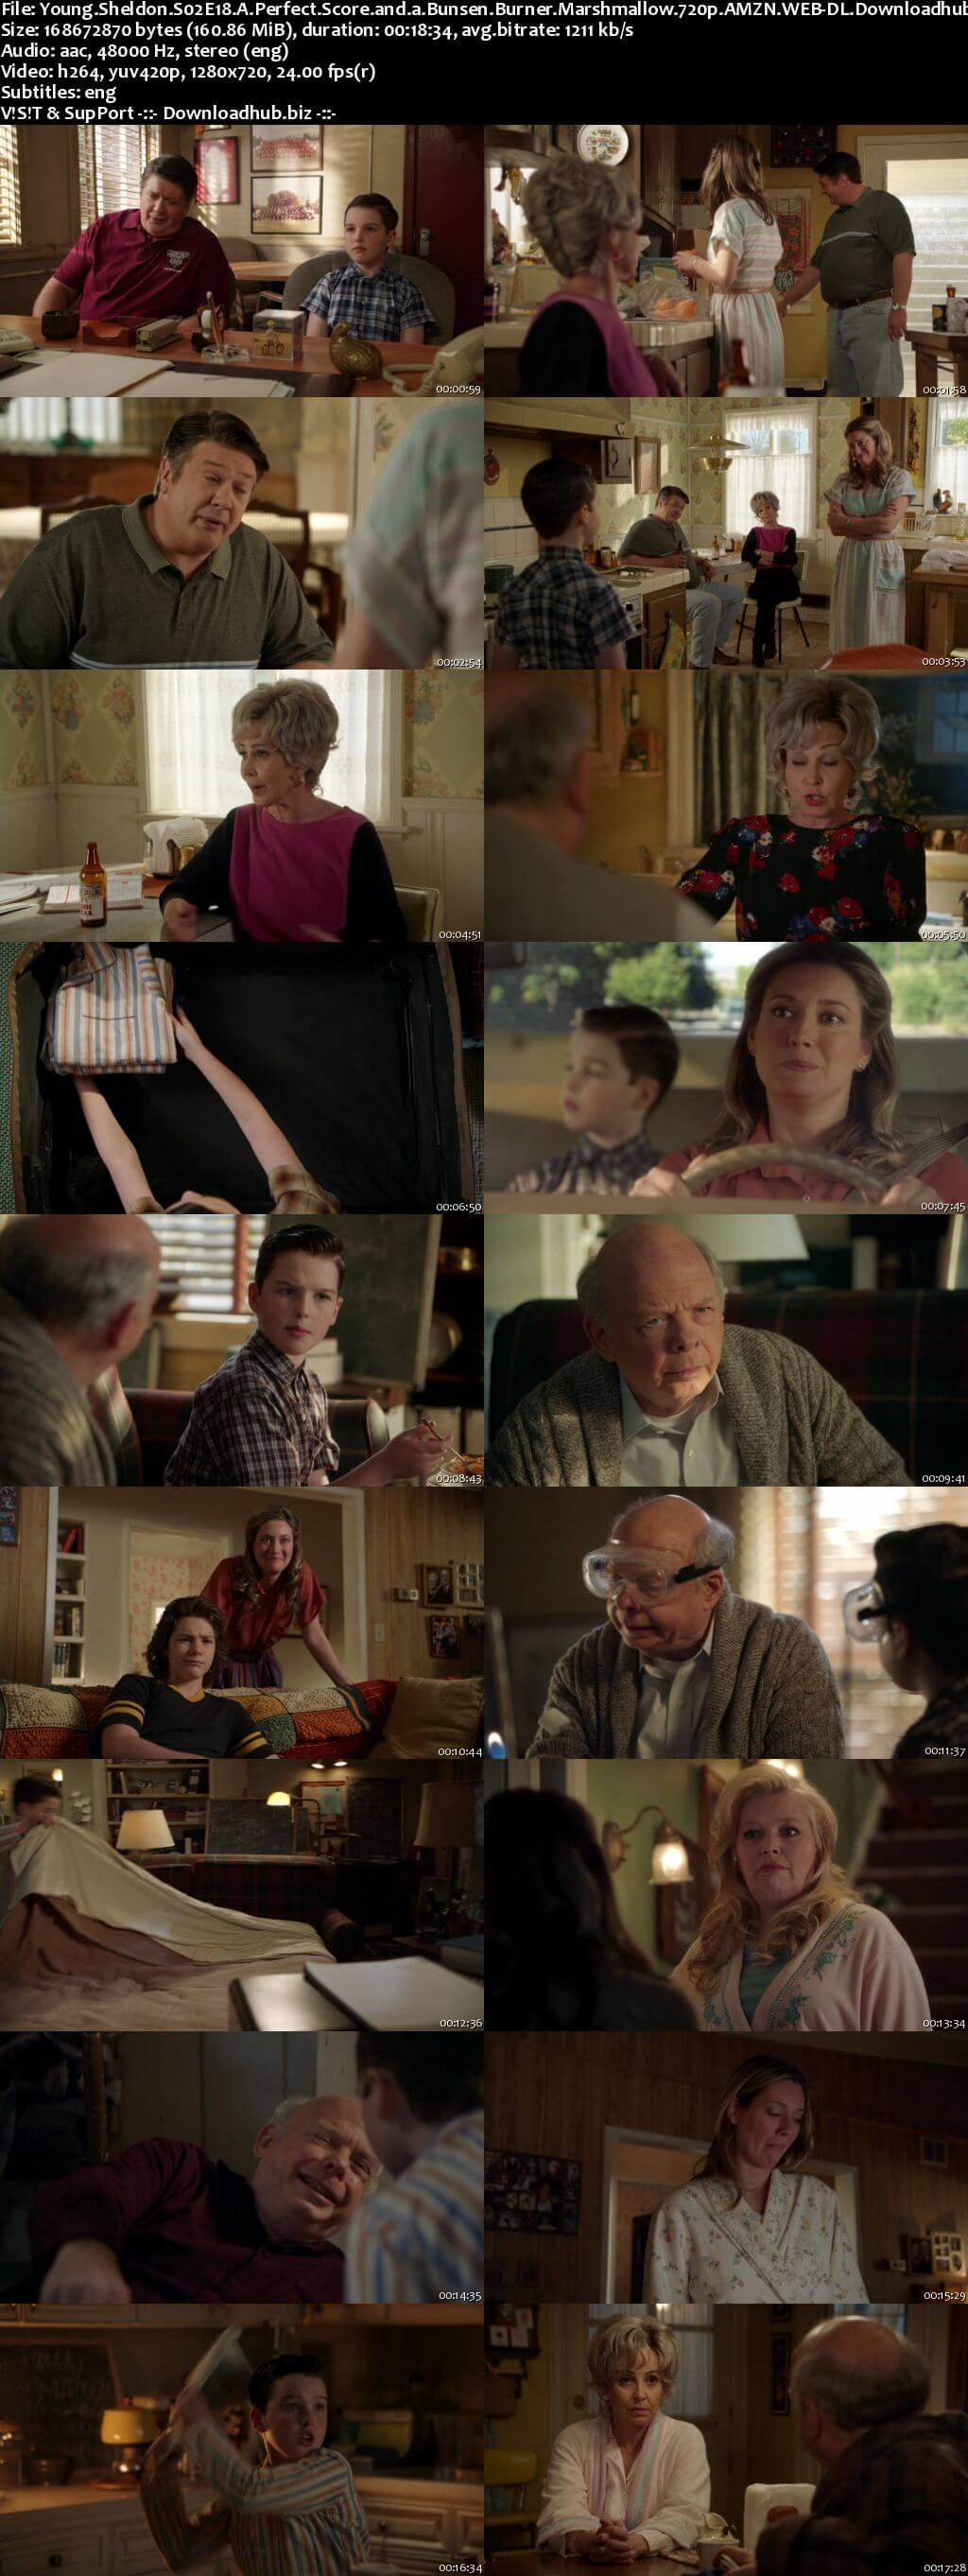 Young Sheldon S02E18 160MB AMZN WEB-DL 720p ESubs